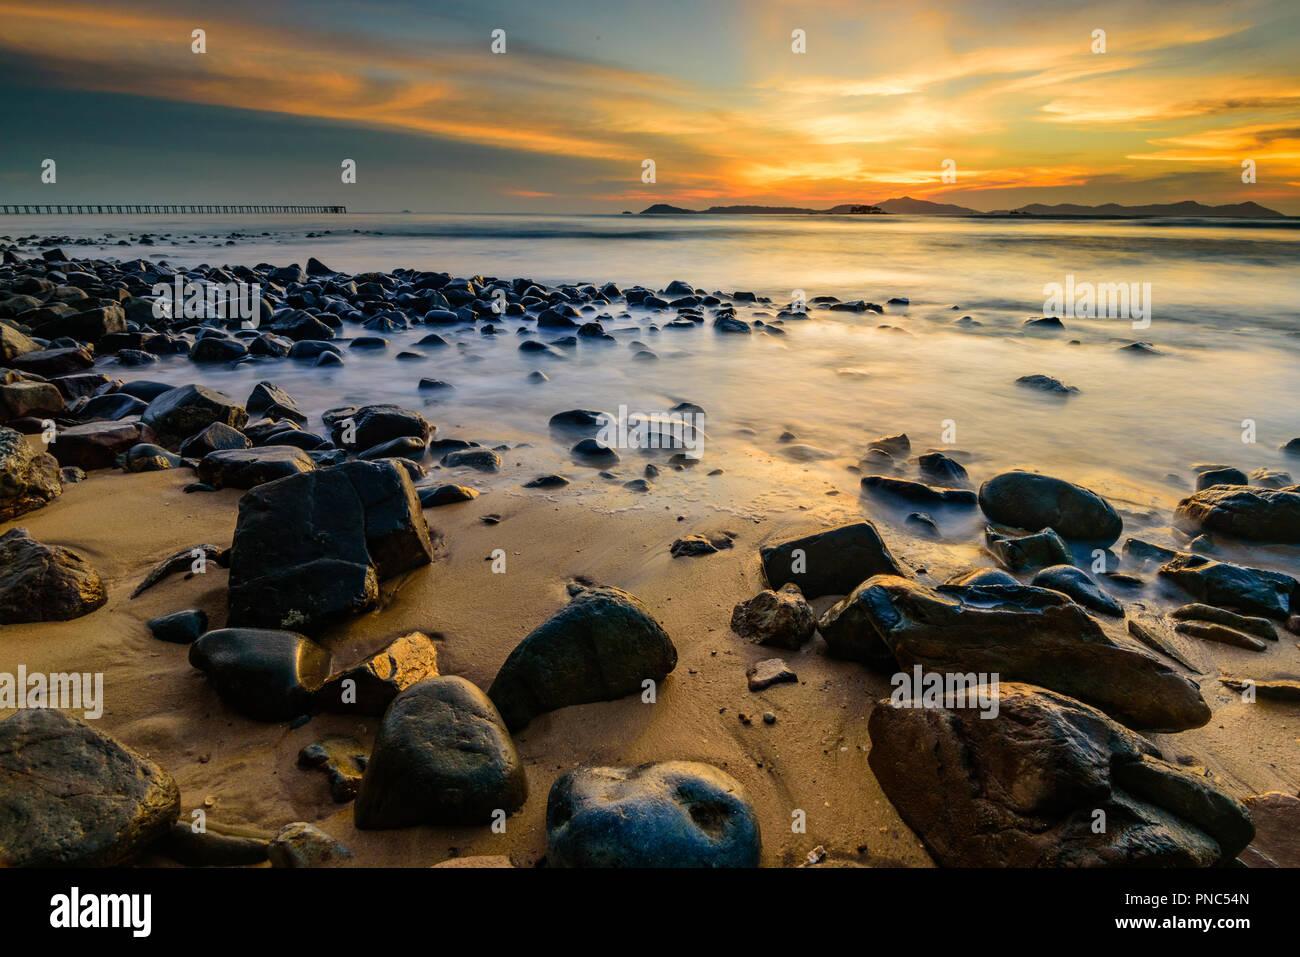 Wonderful Sunset in West Borneo - Stock Image